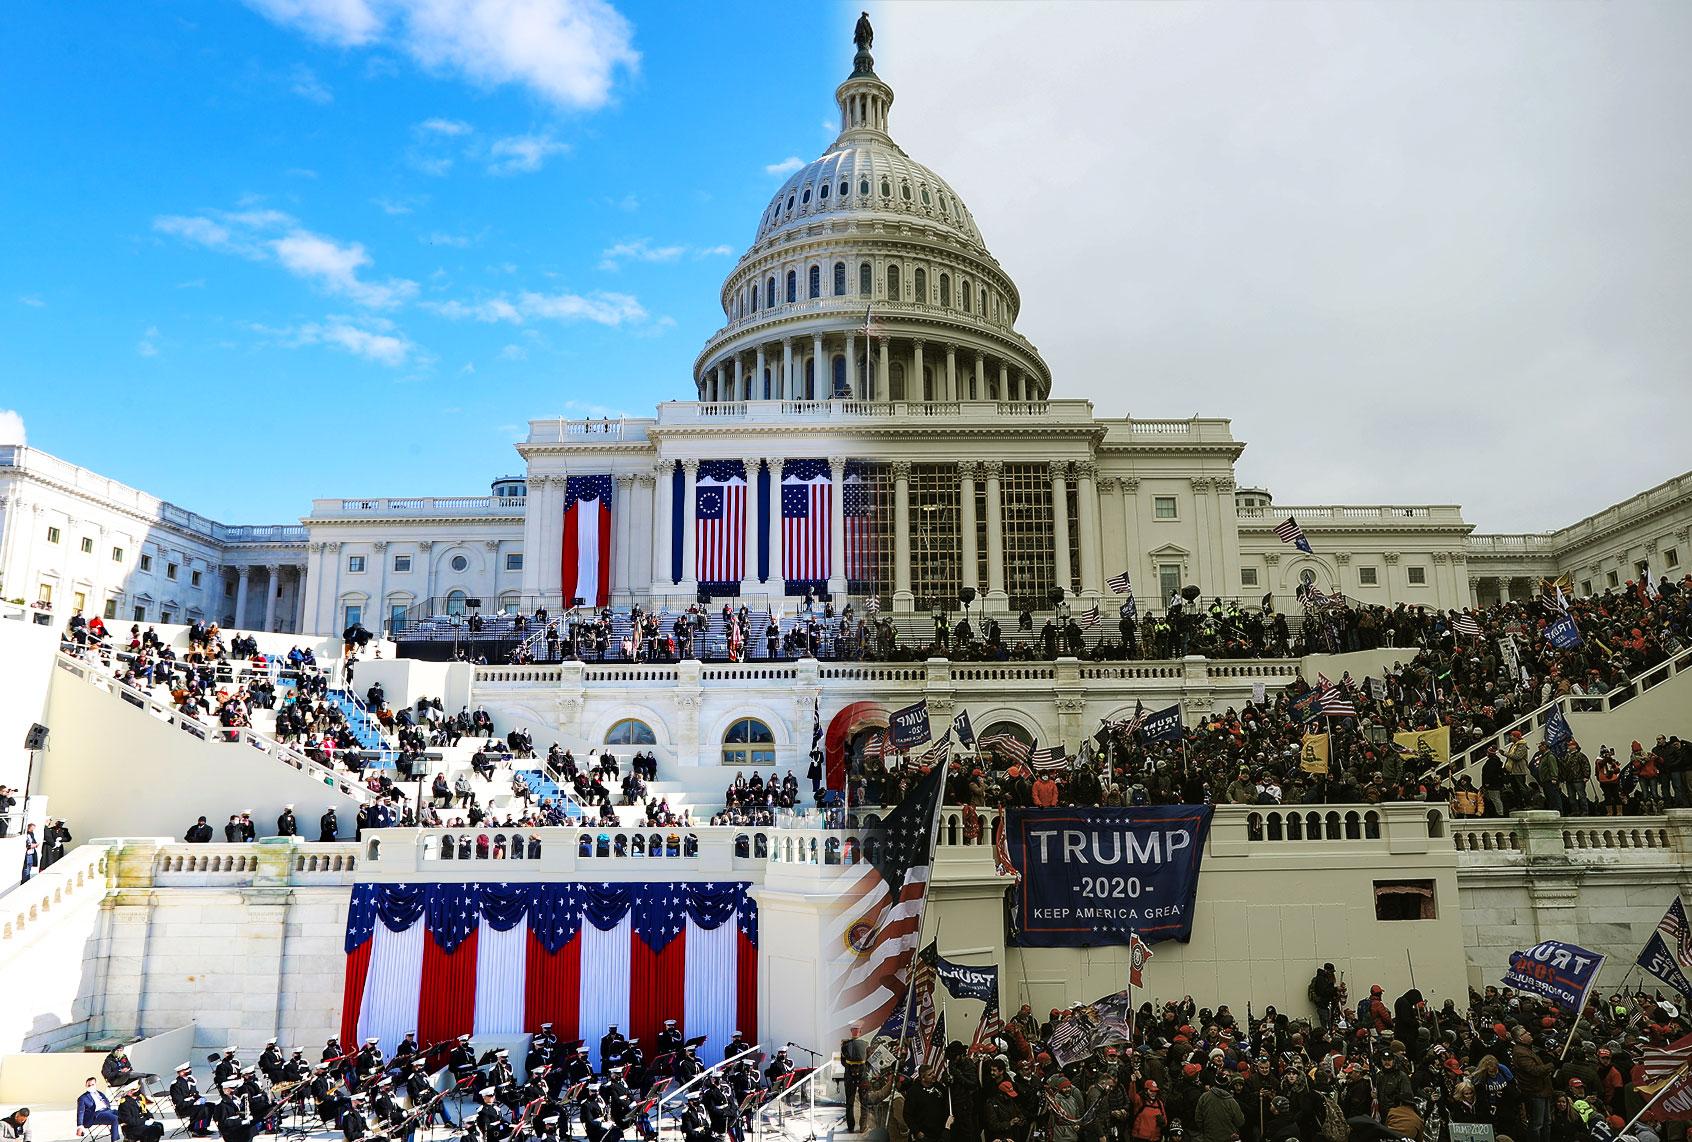 inauguration-capitol-riot-0120211.jpg